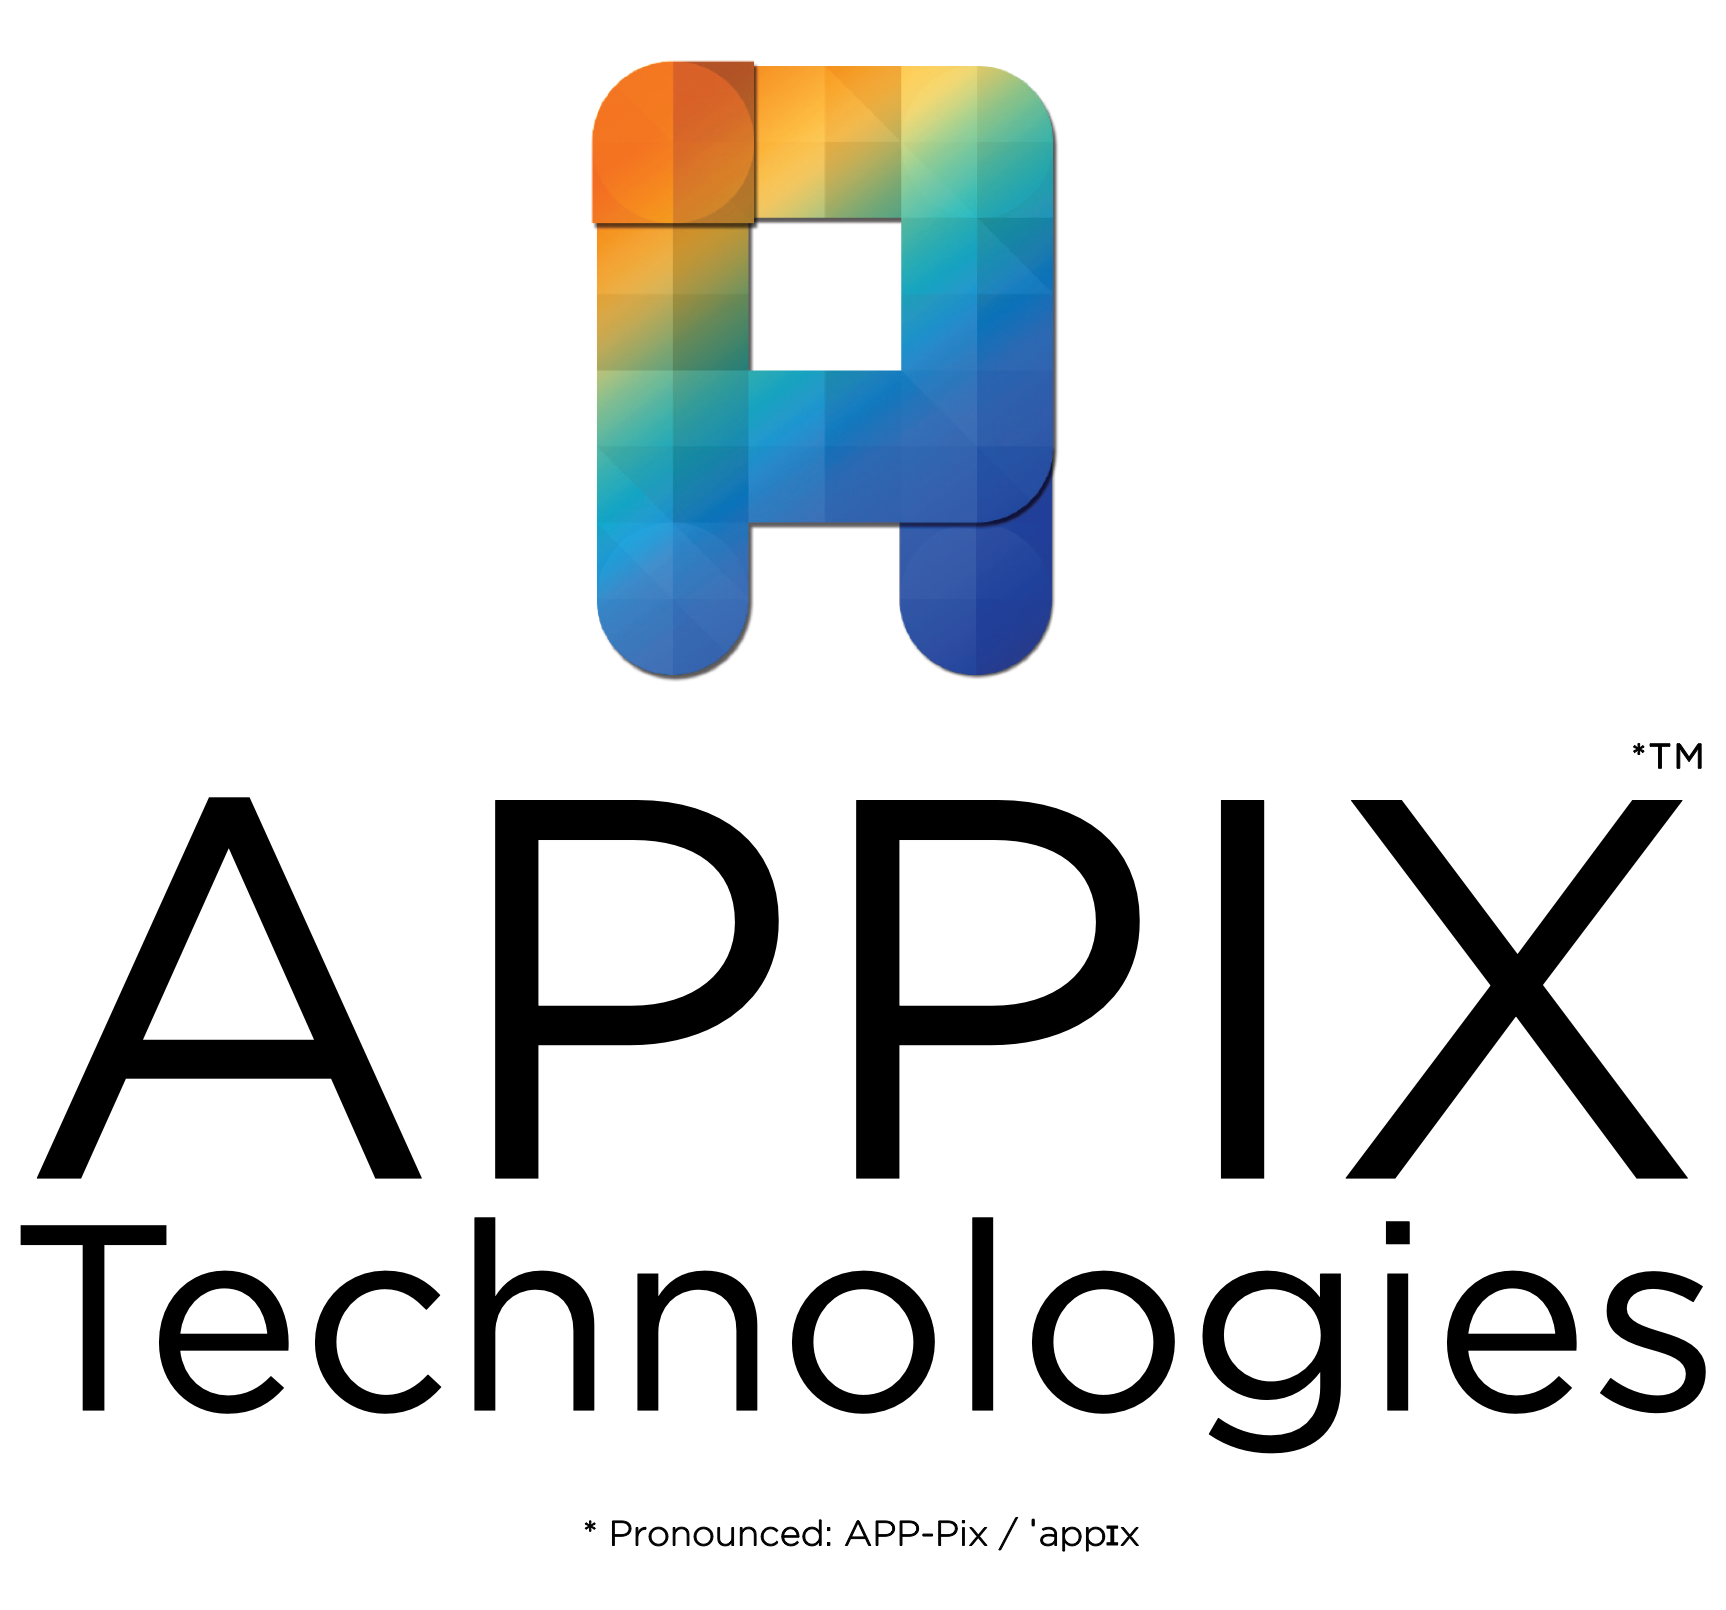 APPIX Technologies